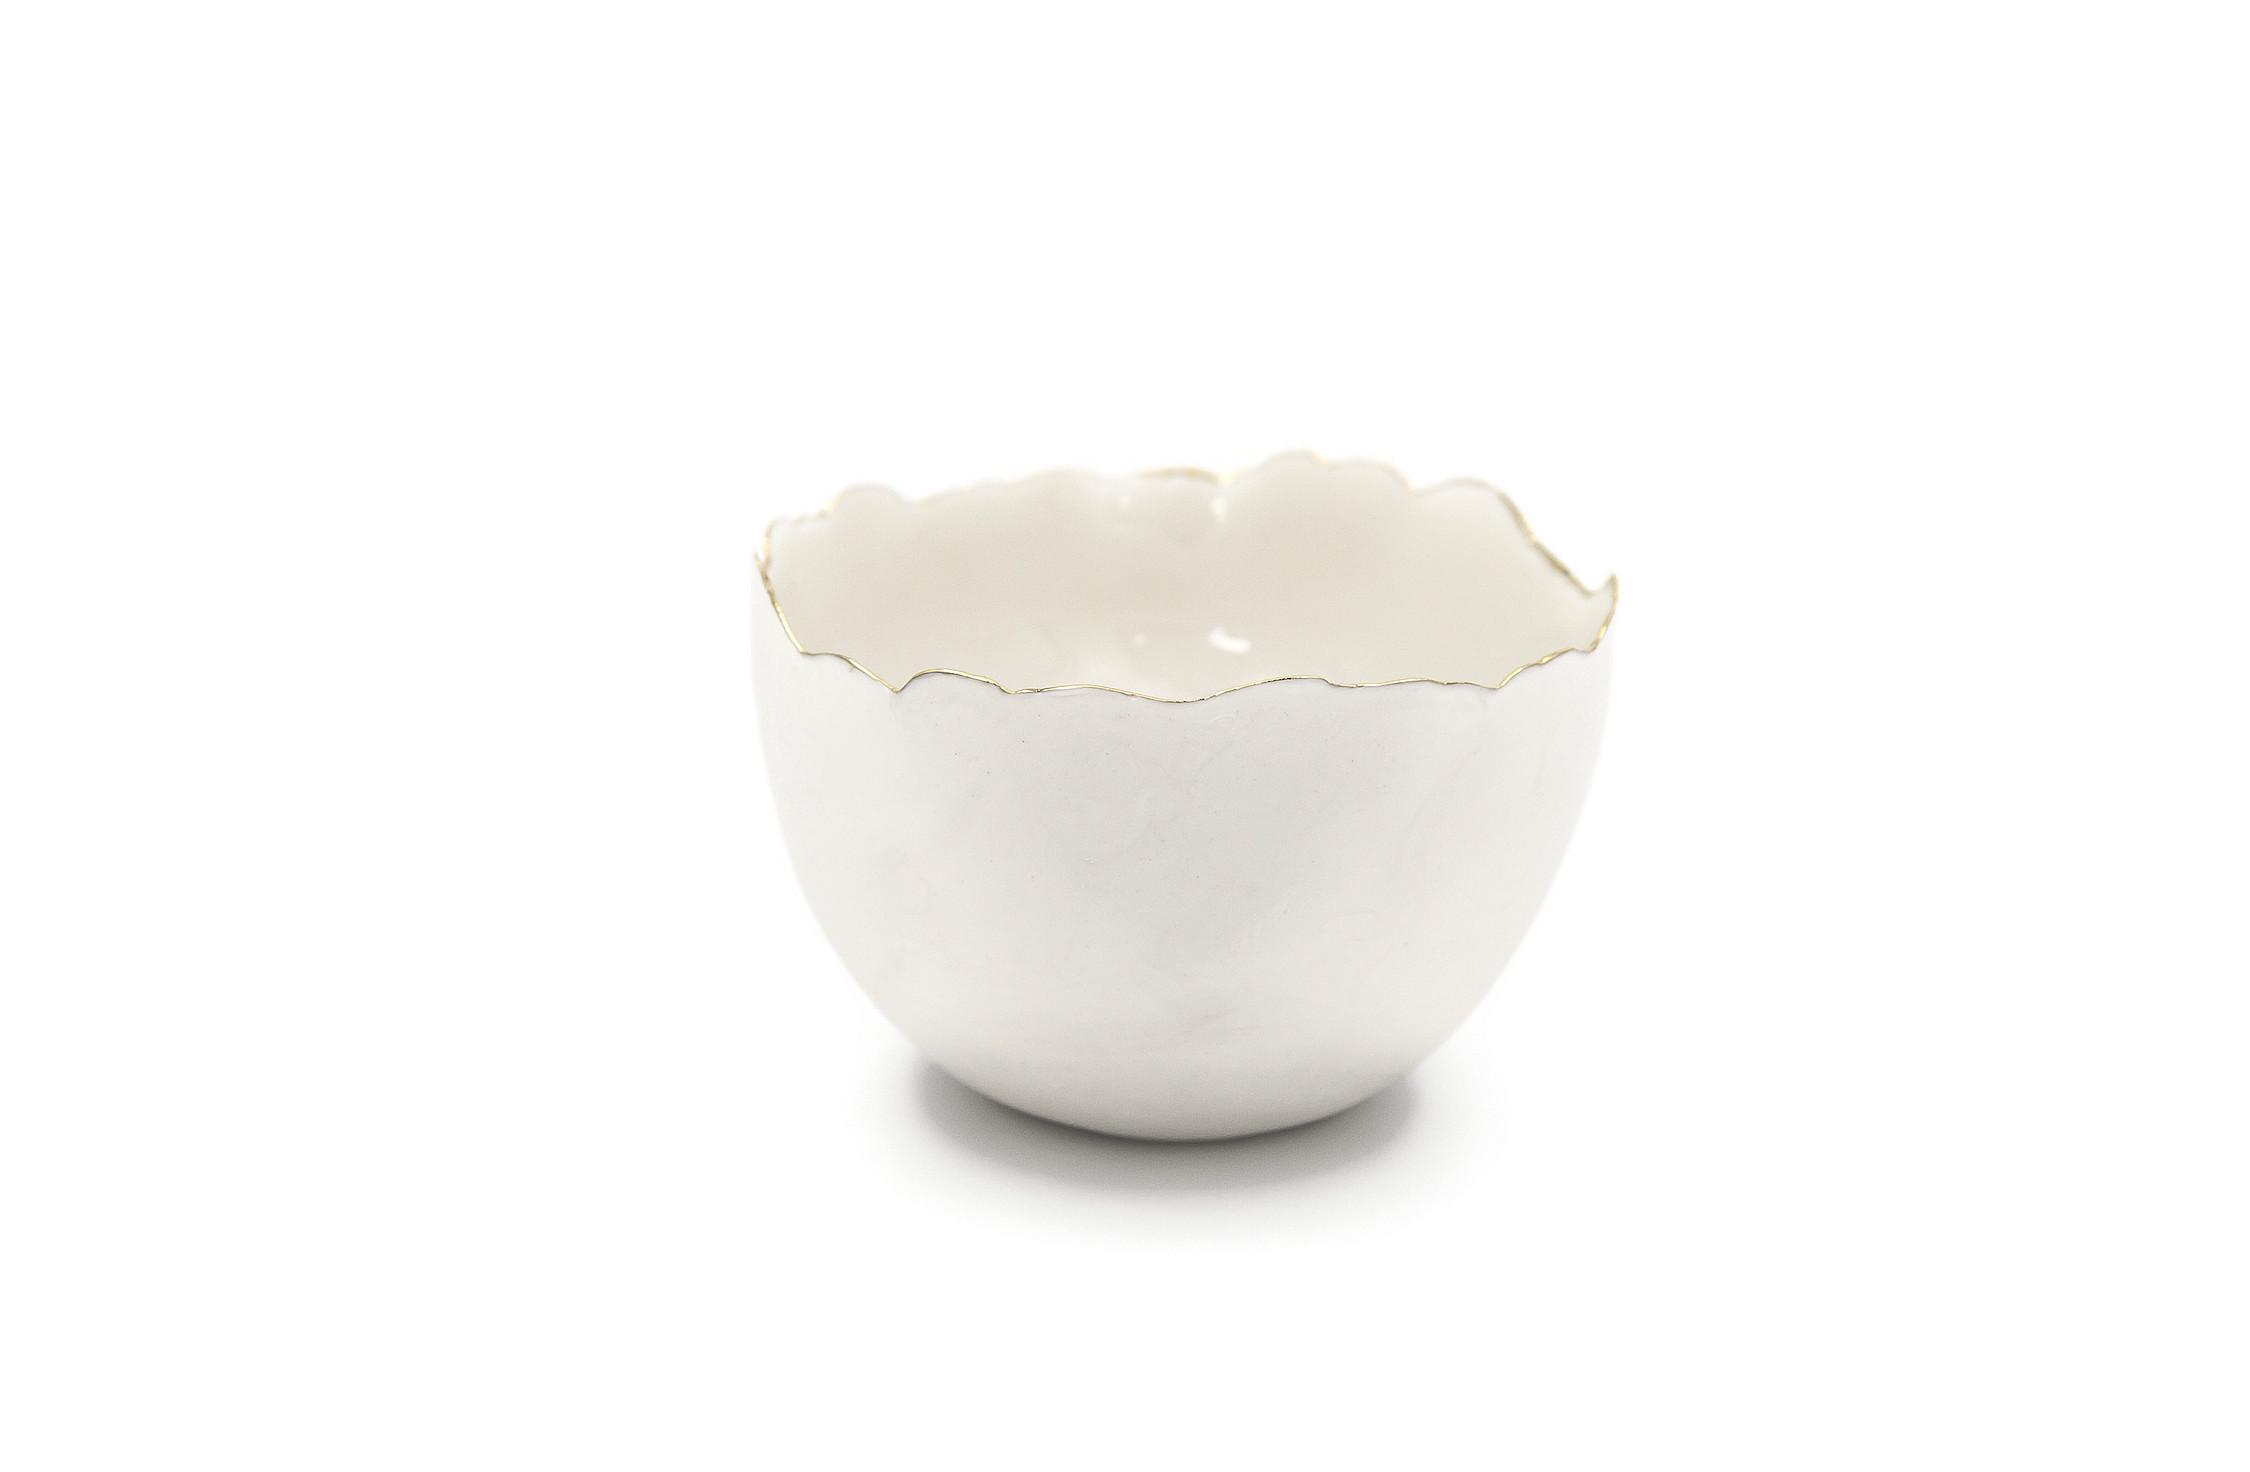 Collectible Porcelain White Bowls